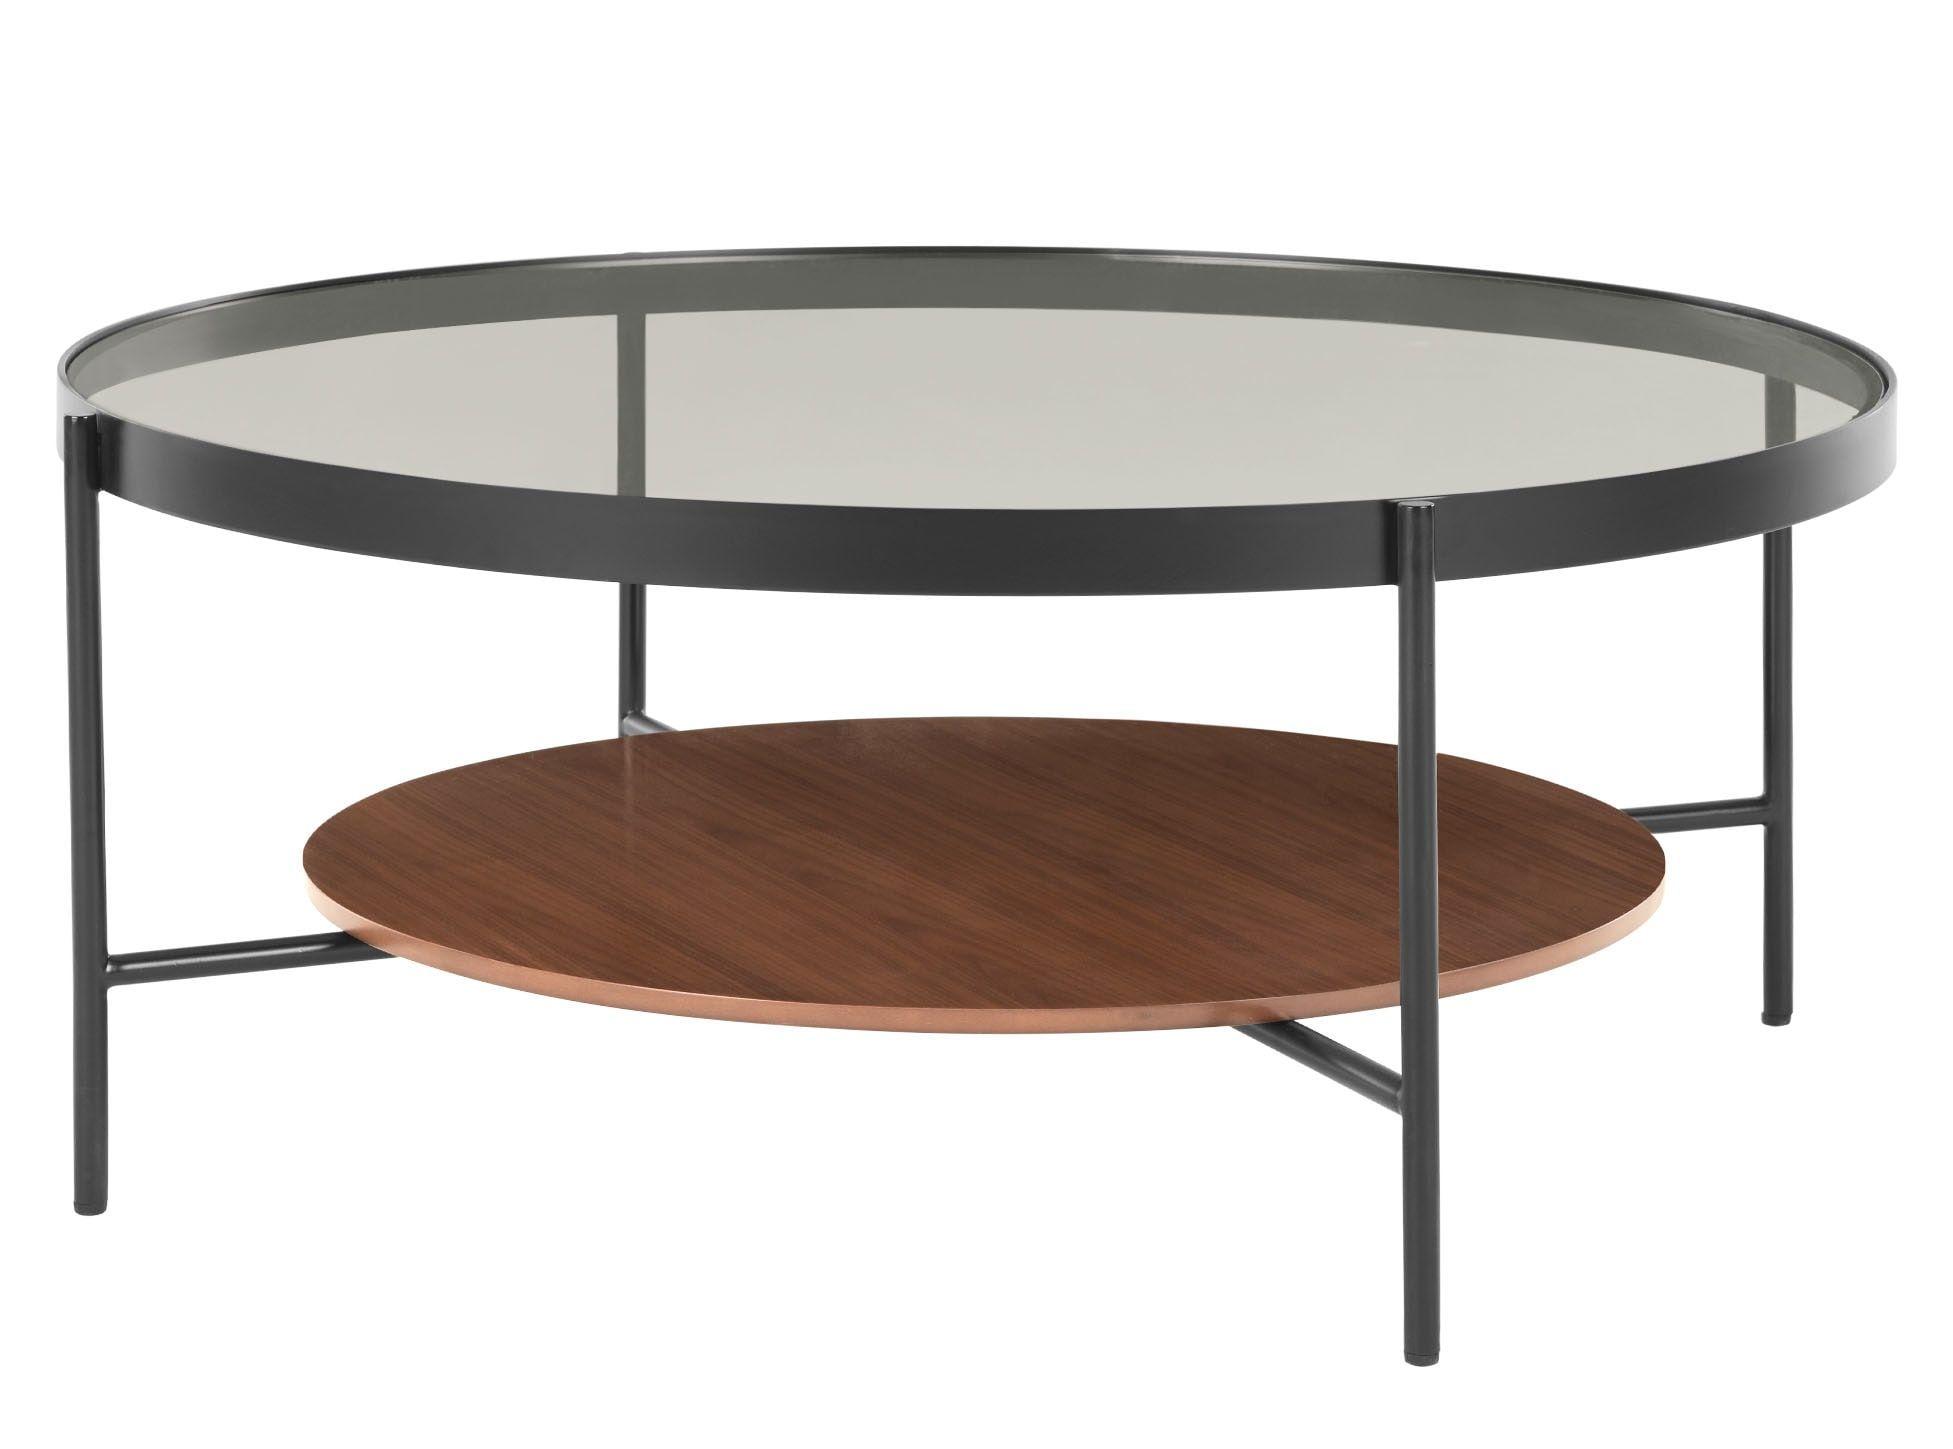 Kameko Table Basse Noyer Et Verre Koffietafel Salontafel Bijzettafel [ 1449 x 1953 Pixel ]